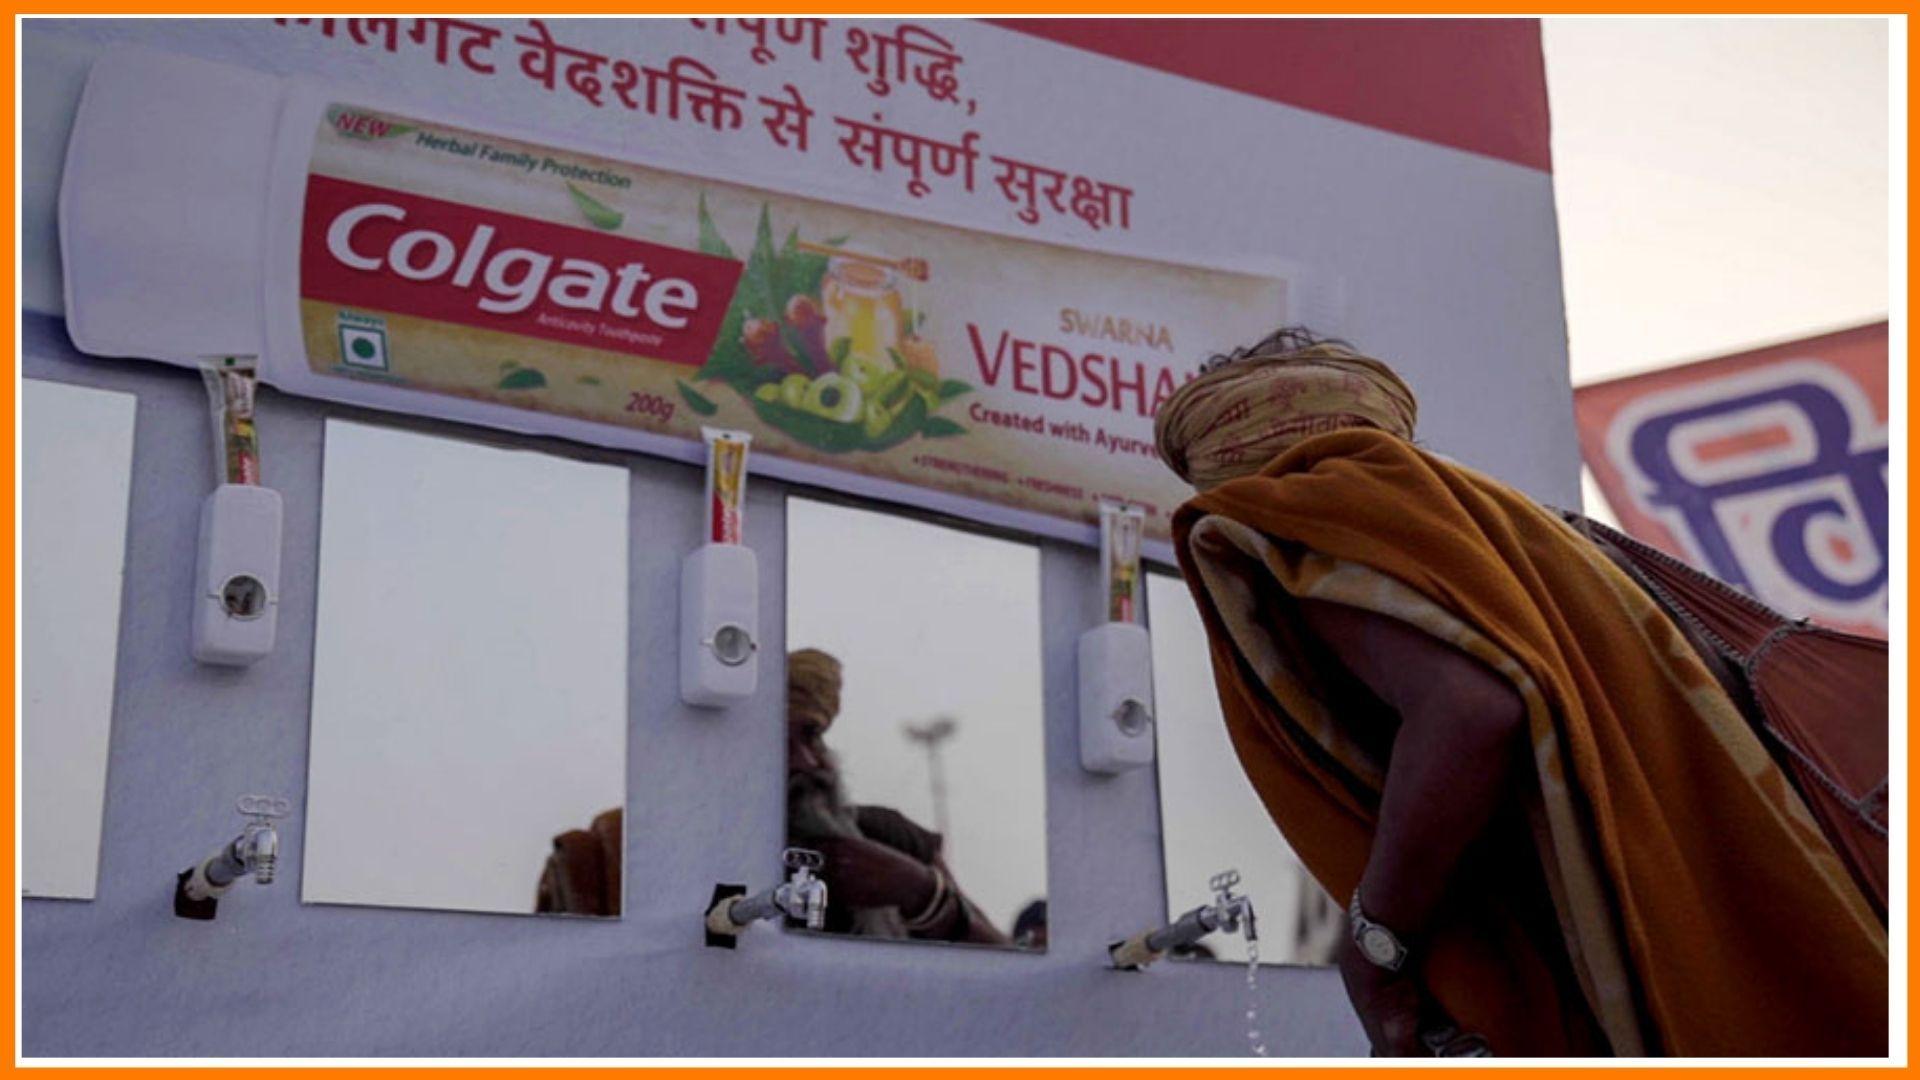 Colgate Kumbh Mela Campaign